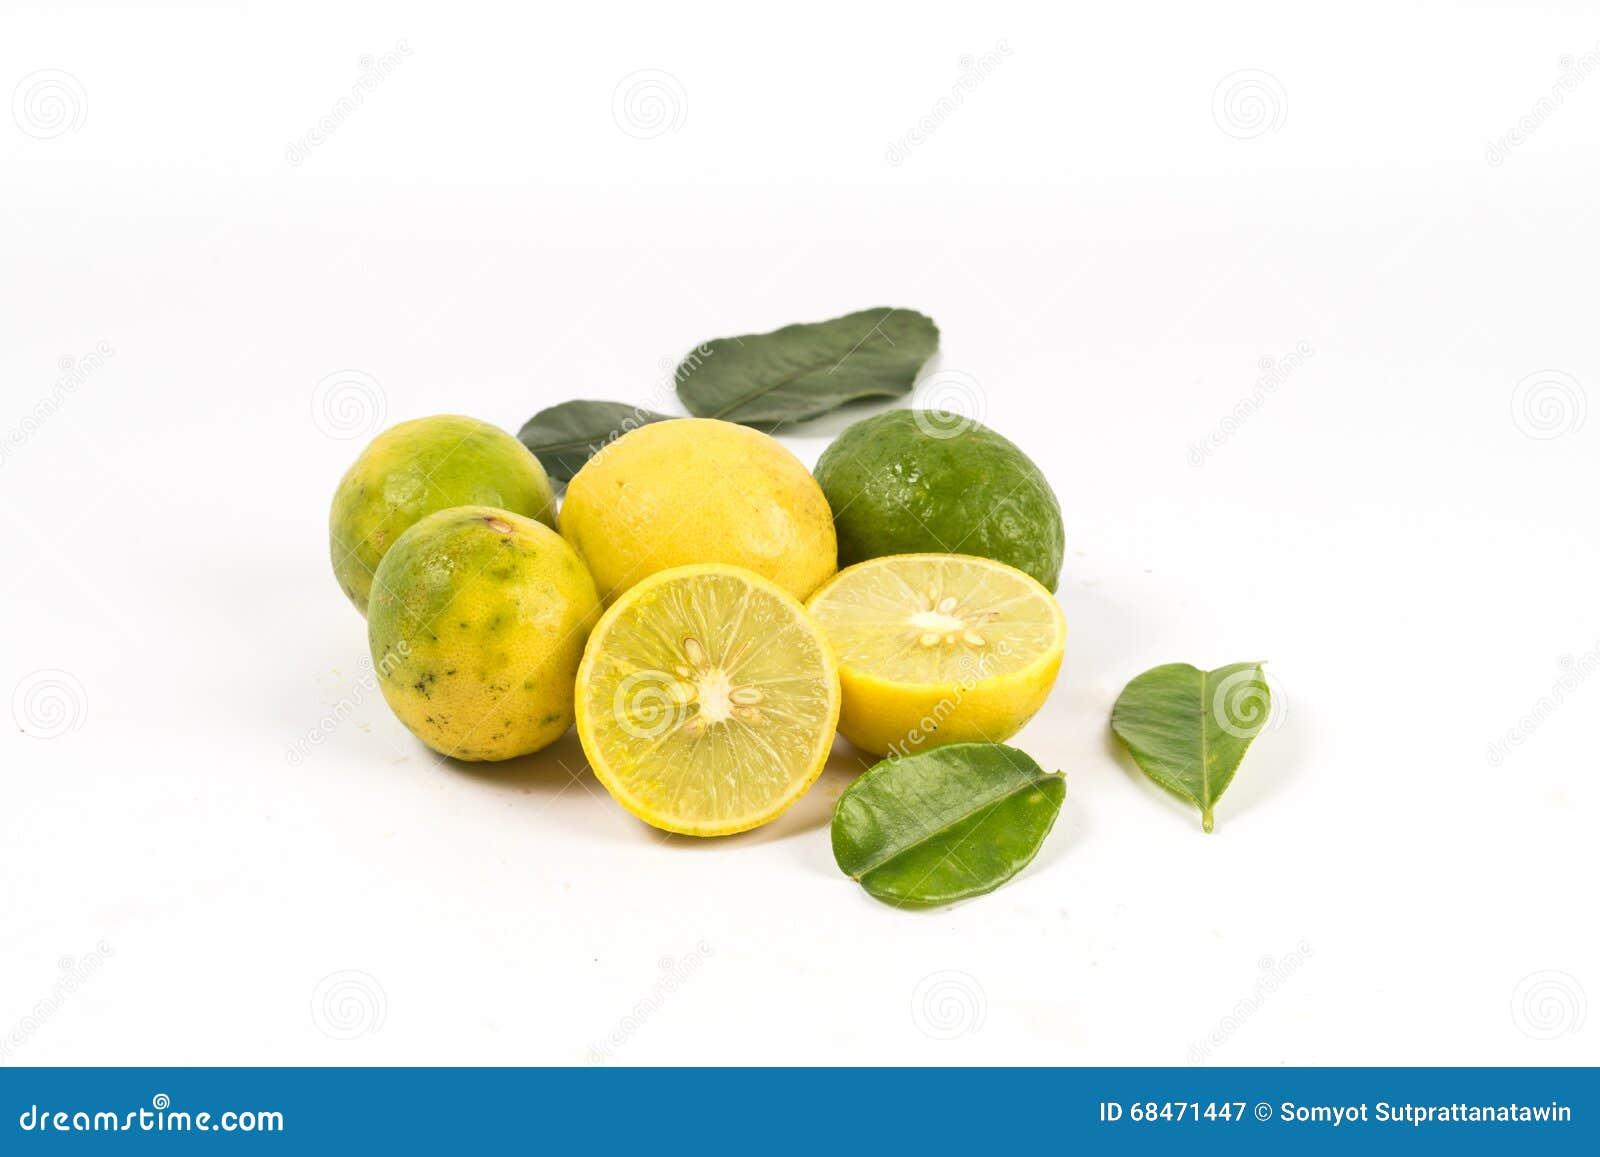 Lemon cut with leaves